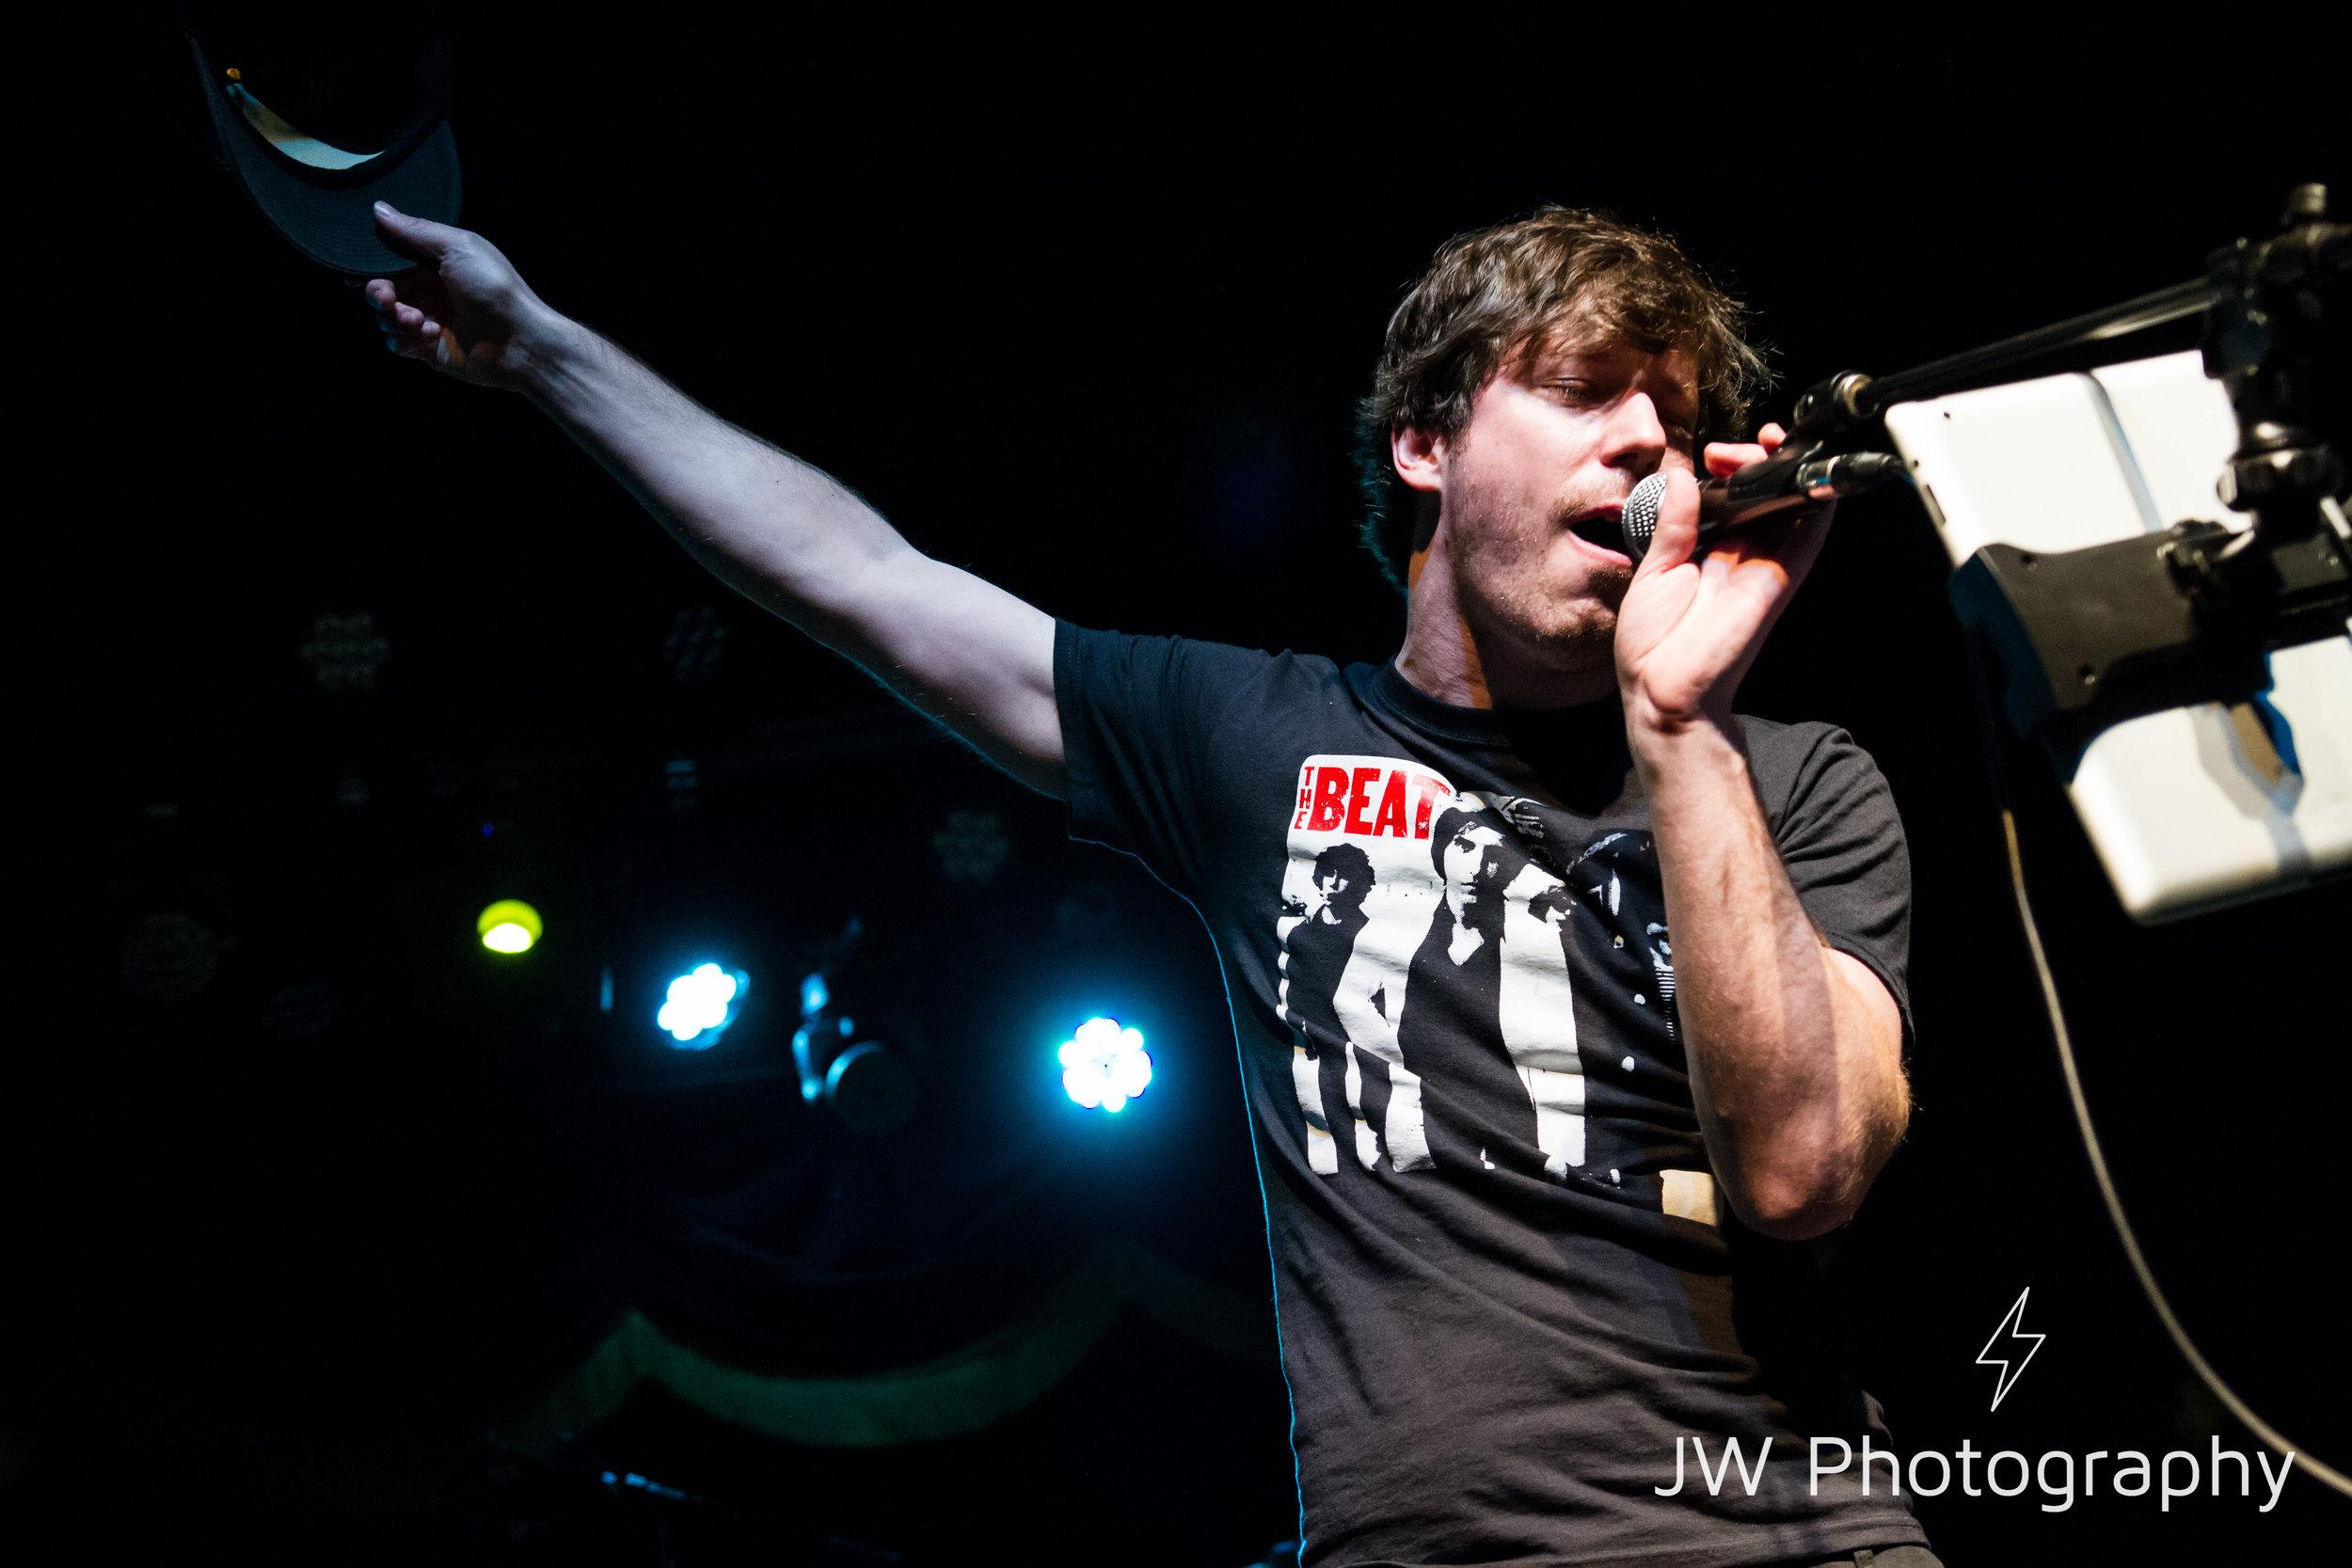 Live Music — JW Photography